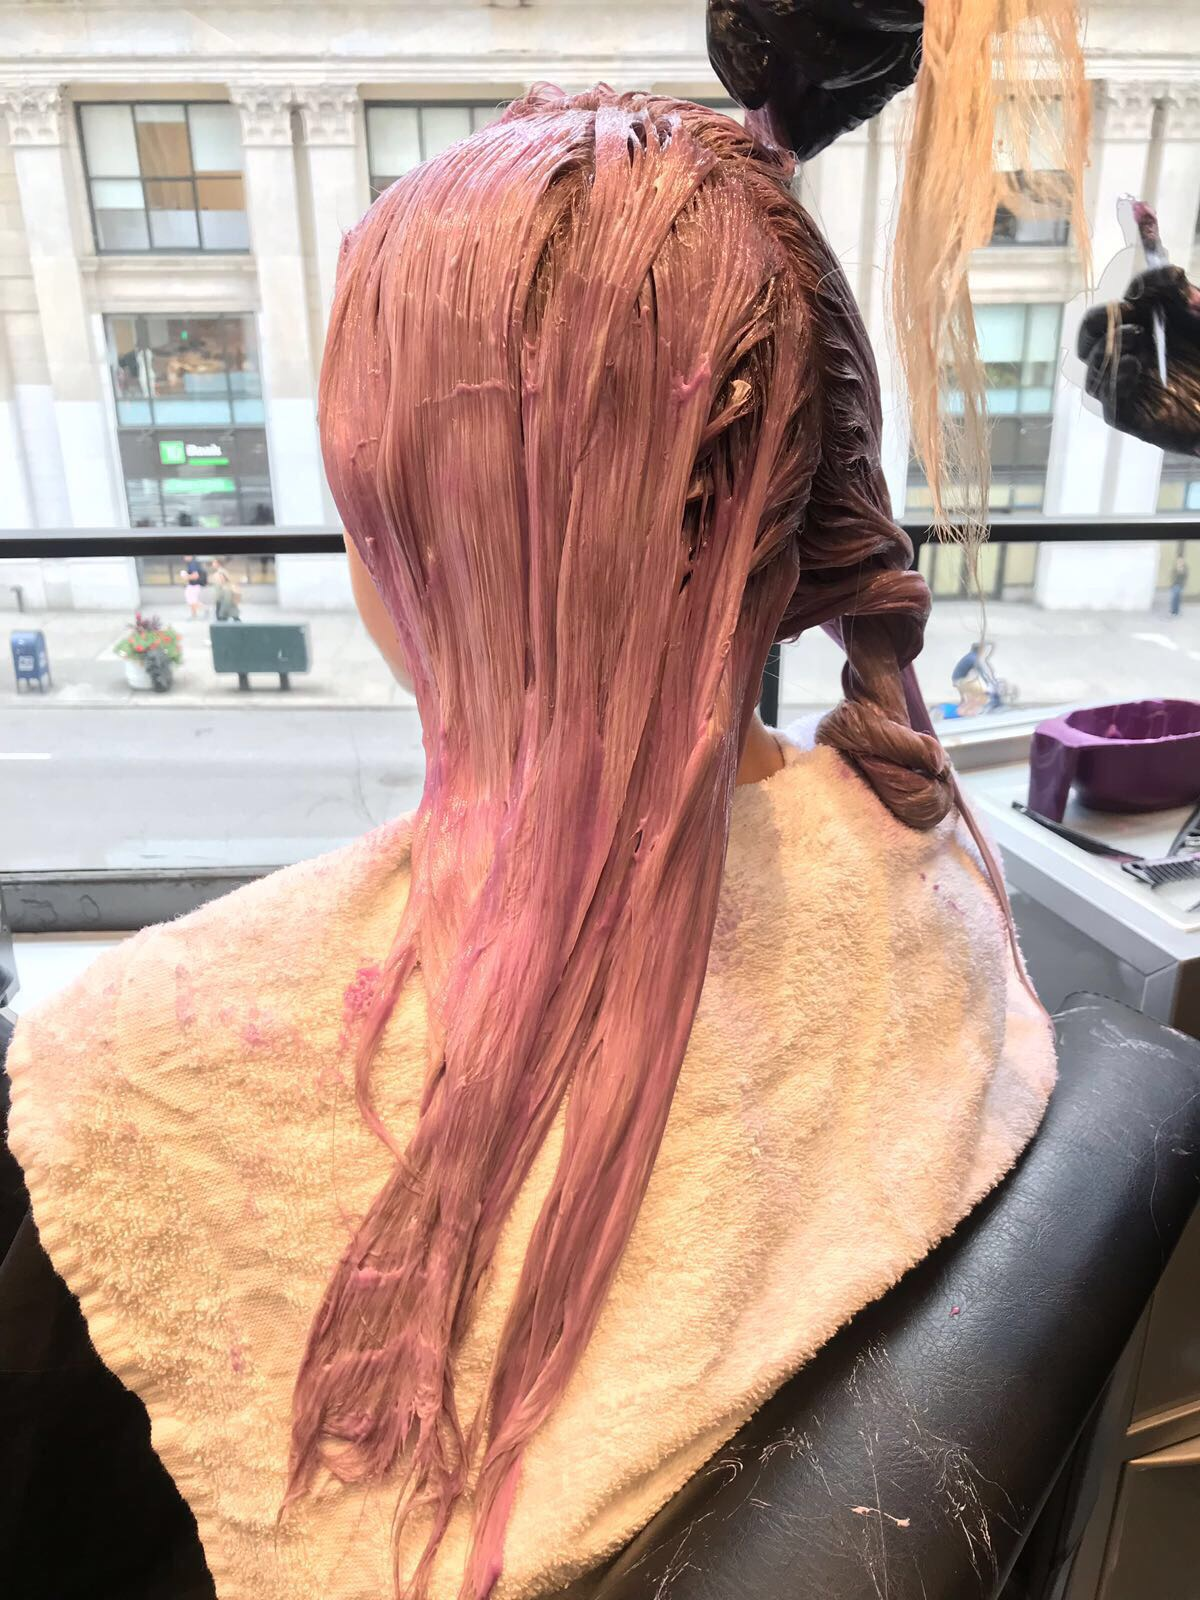 model having pink hair dye applied